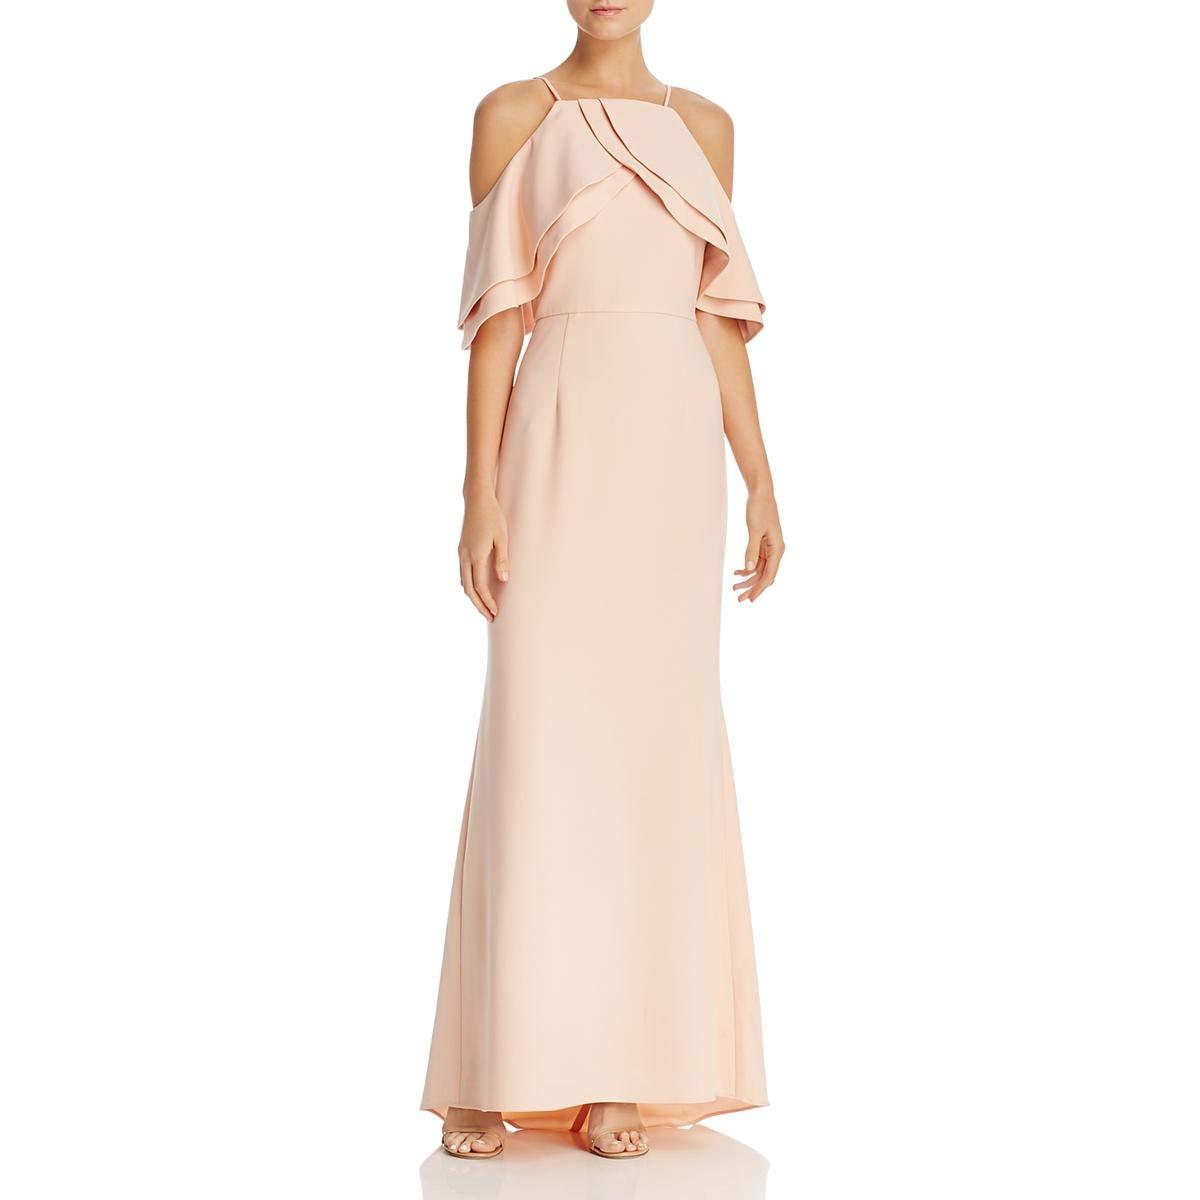 Eliza J Womens Off The Shoulder Ruffled Gown Dress